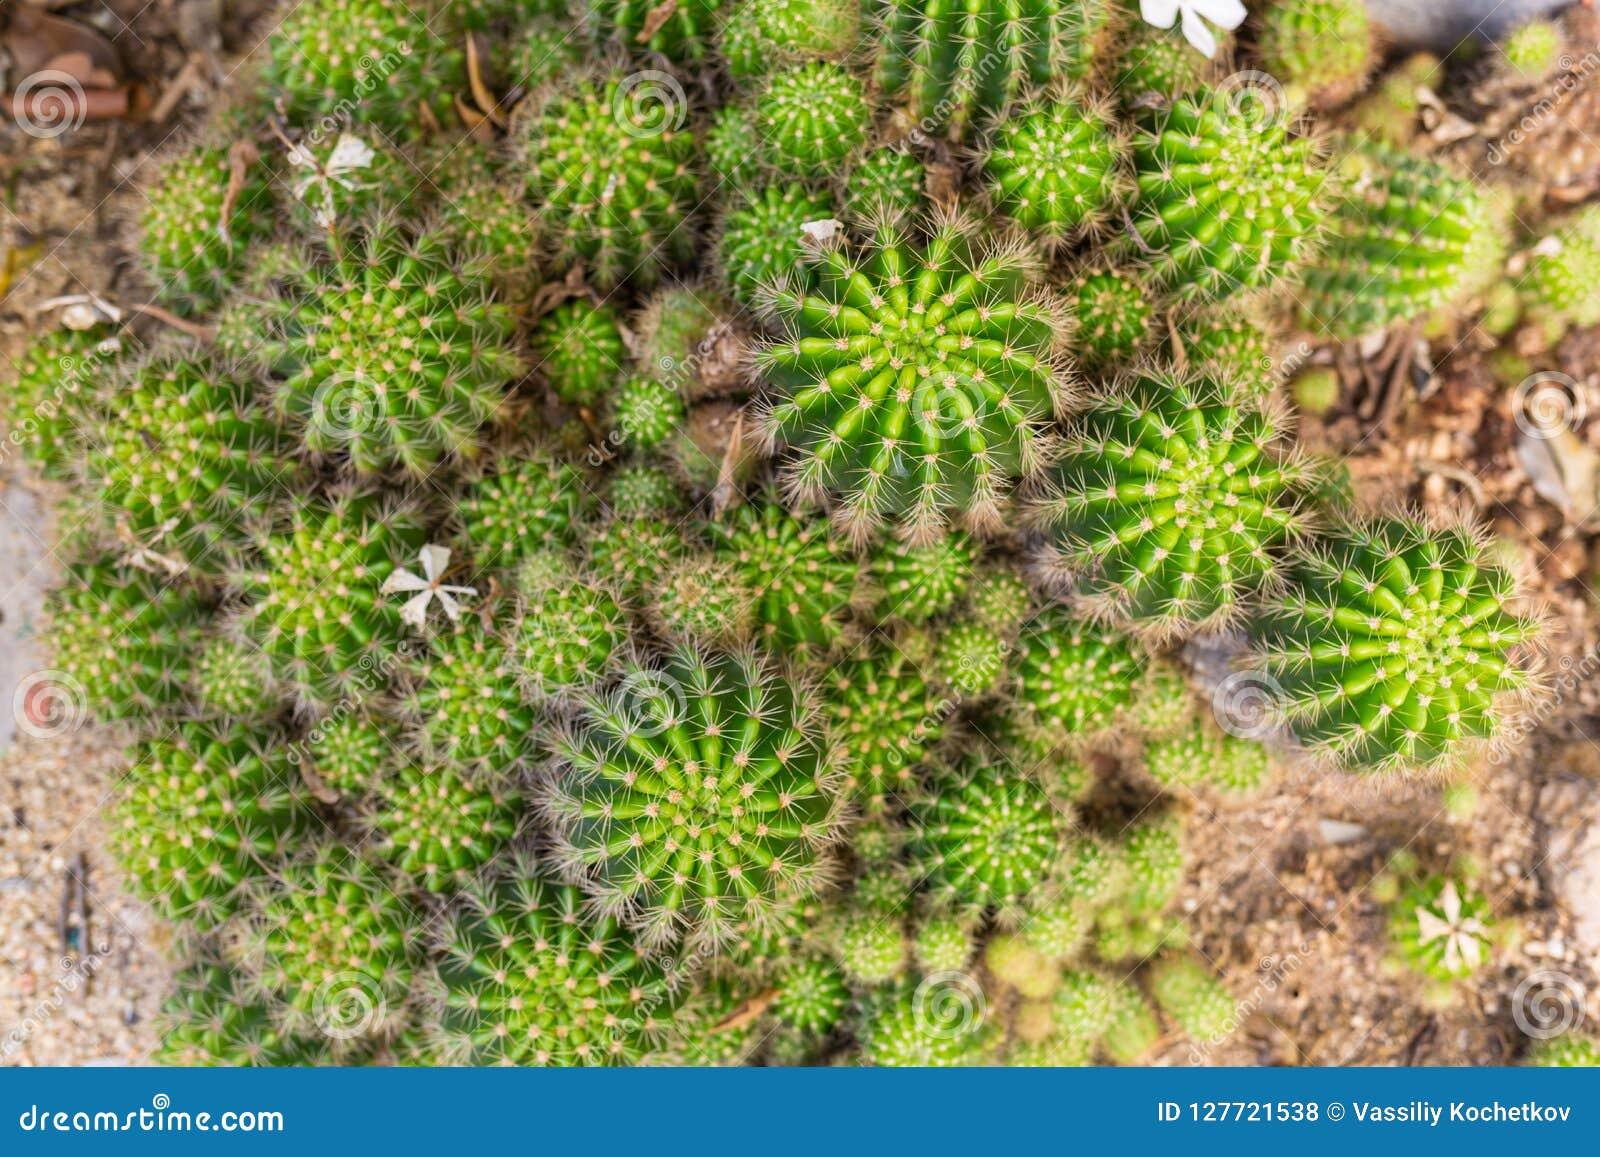 Selective focus close-up top-view shot on Golden barrel cactus Echinocactus grusonii cluster. well known species of